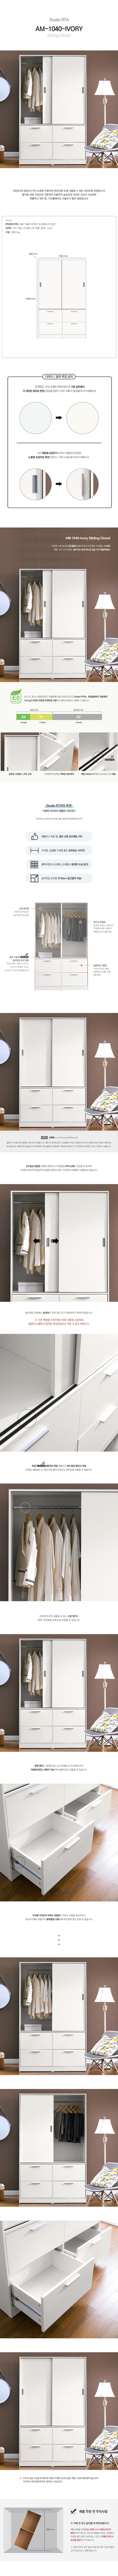 AM-1040-White-Sliding-Closet.jpg